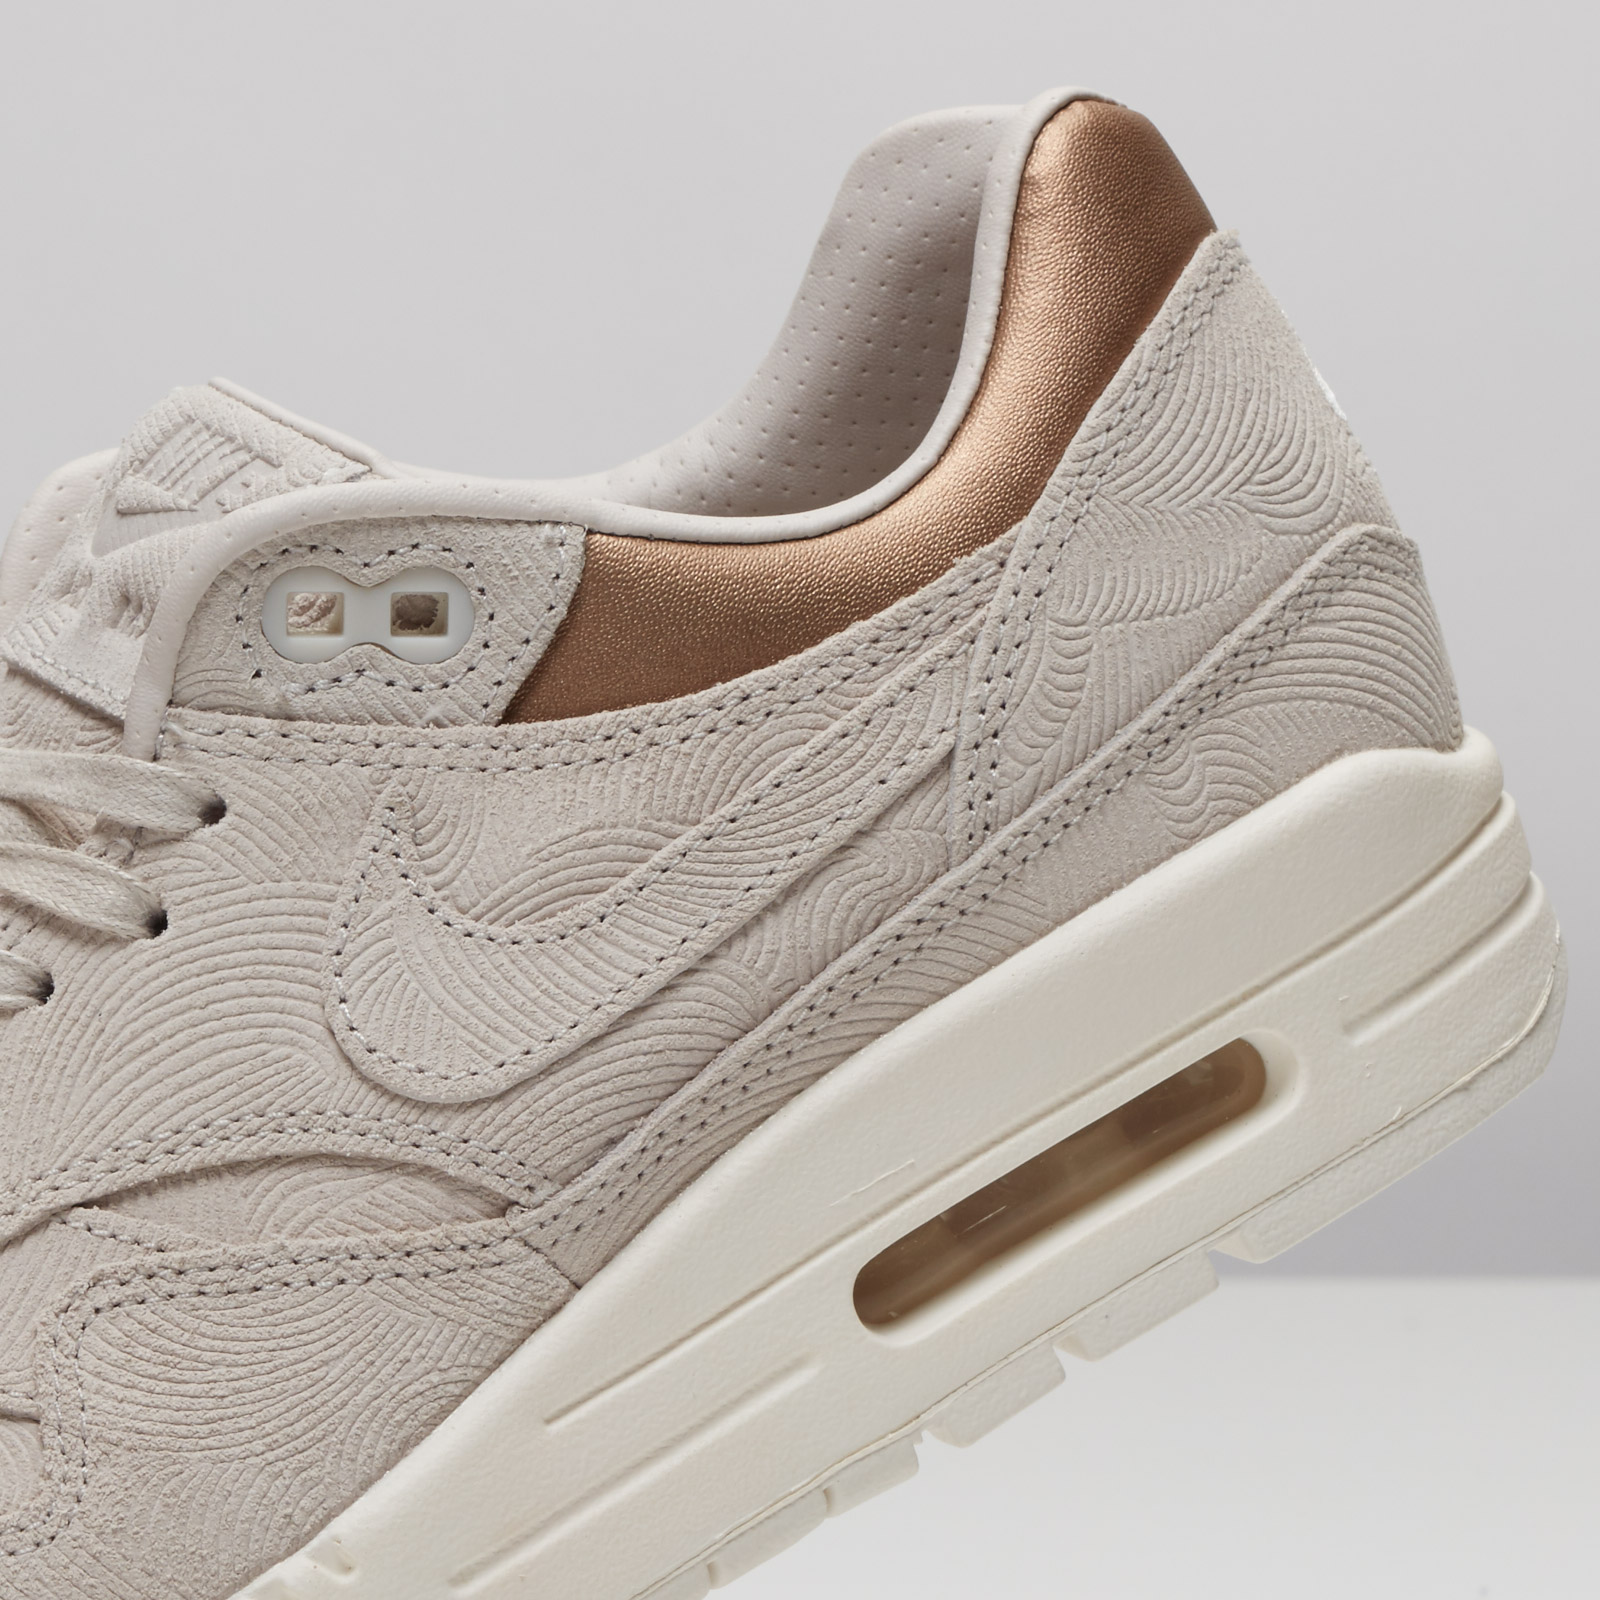 Nike Wmns Air Max 1 Premium 454746 009 Sneakersnstuff